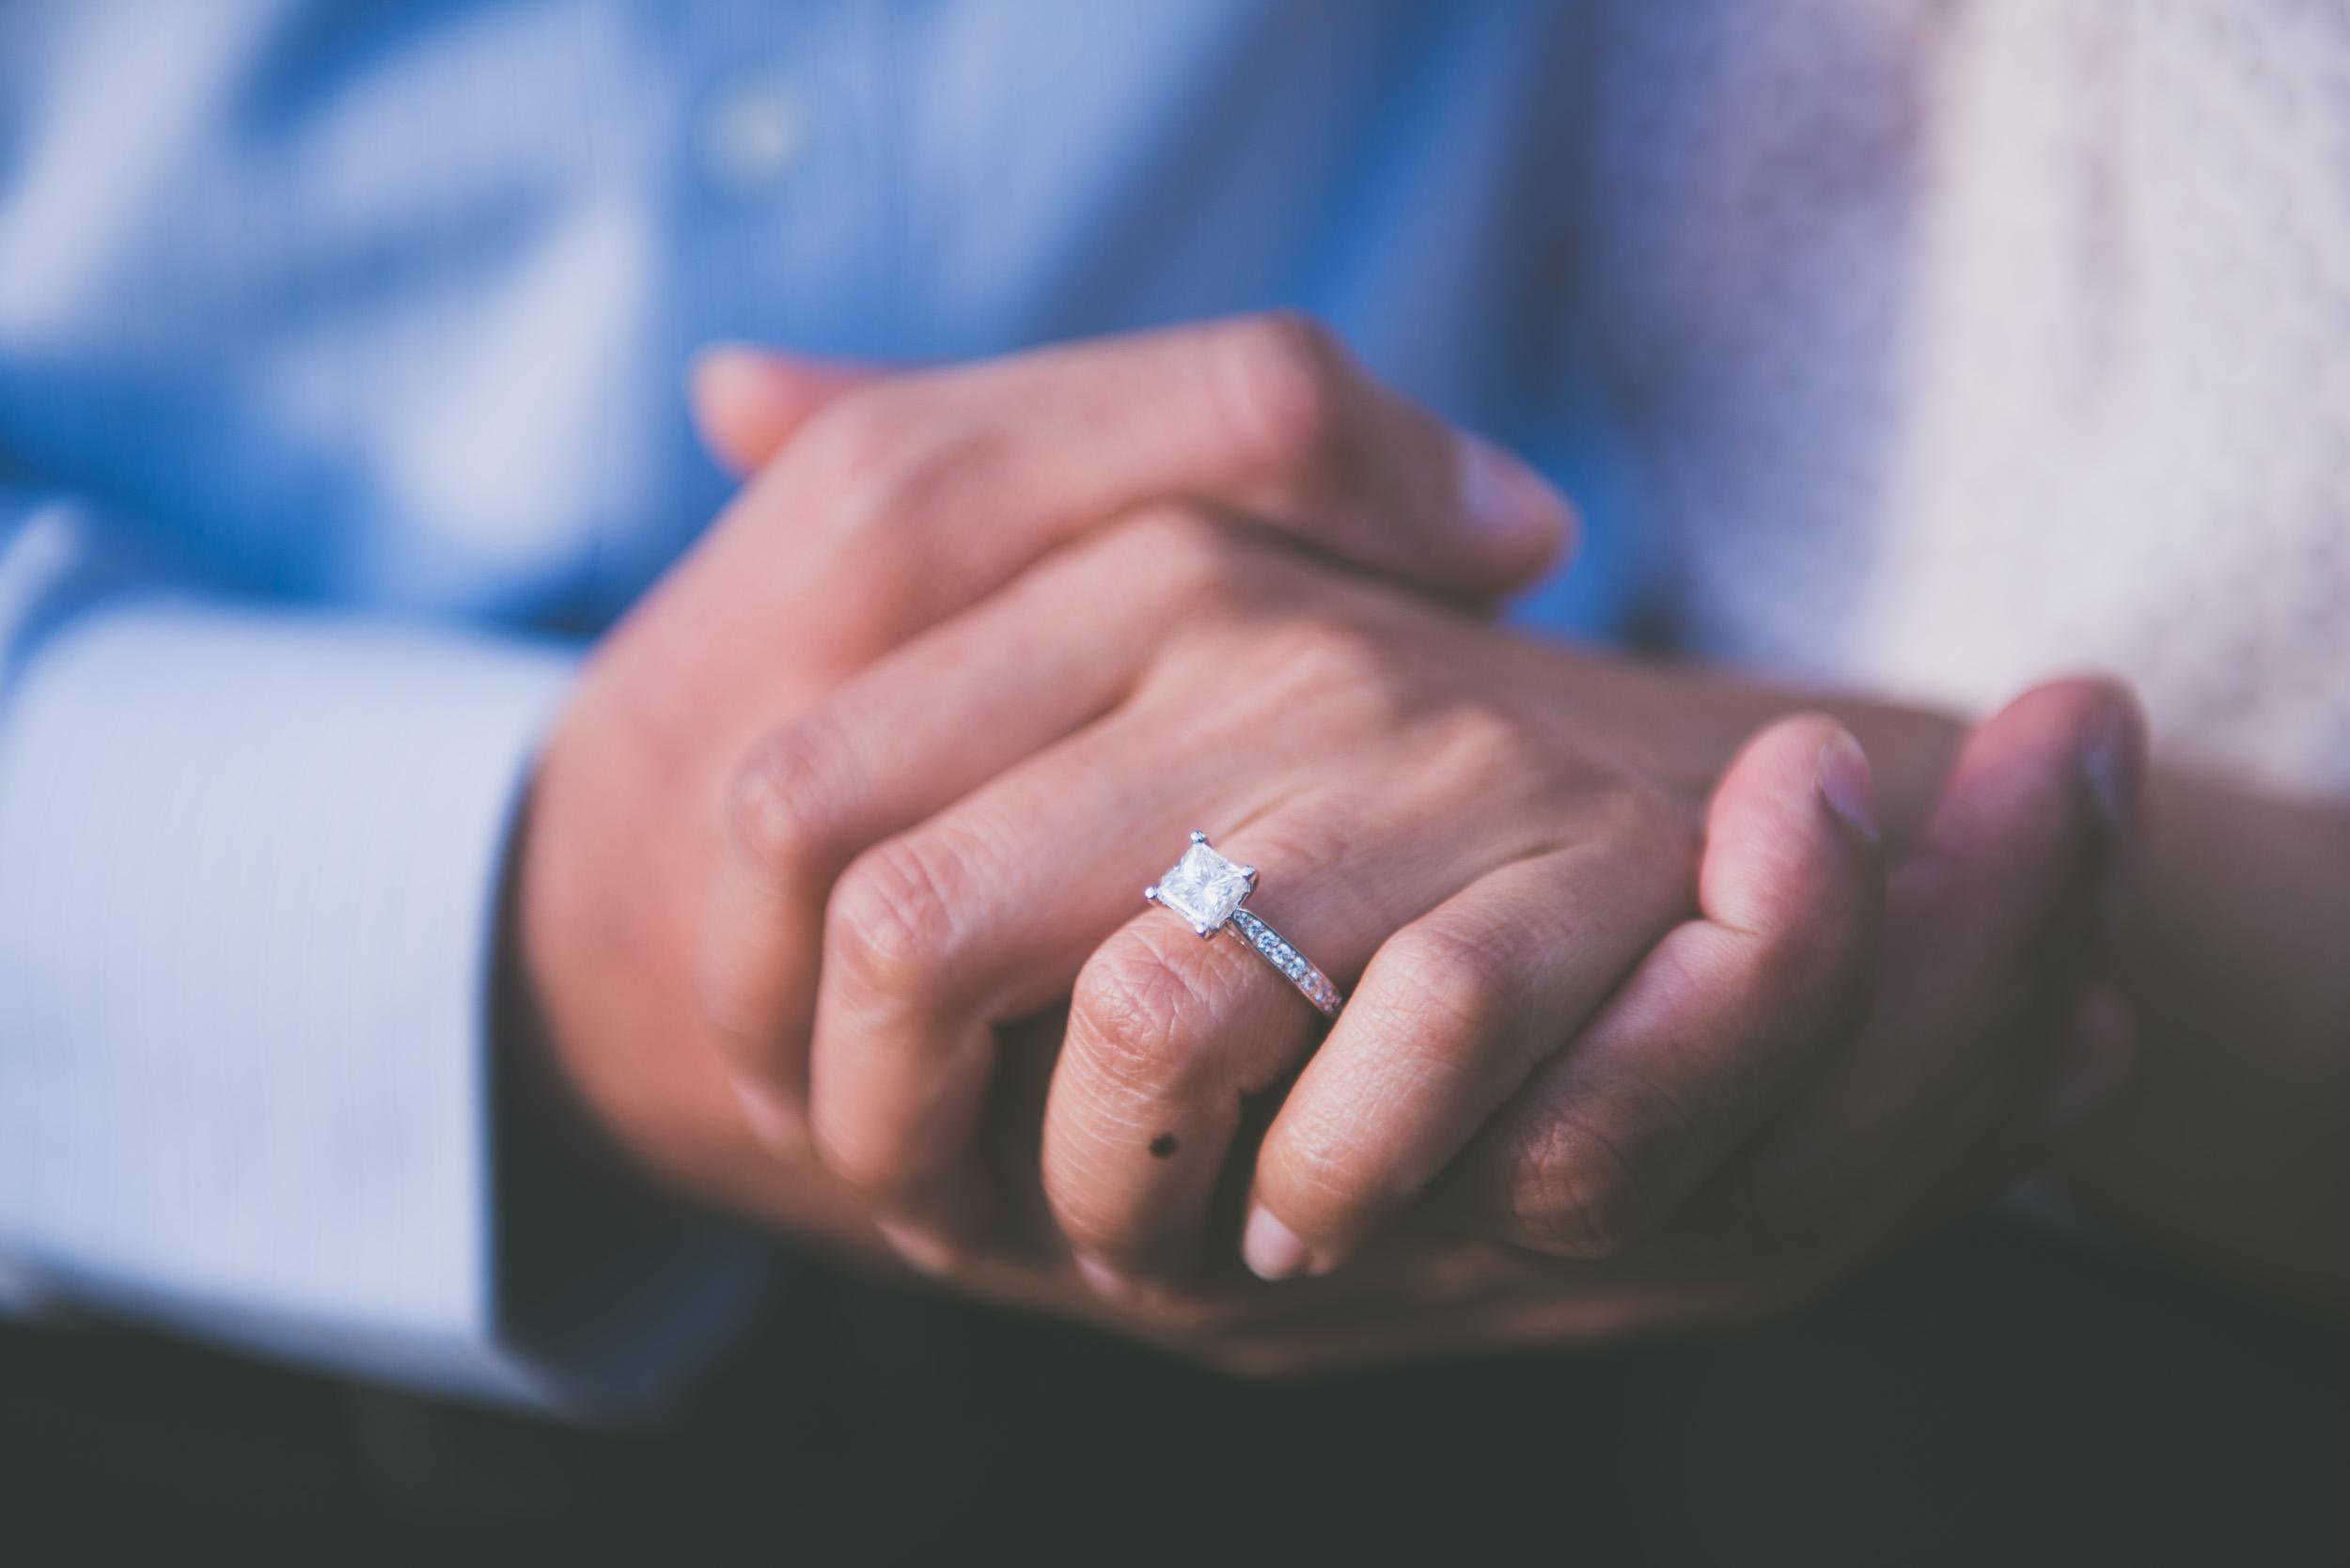 Engagement ring - Engagement portraits -  Photo credit Nicola Bailey.jpg